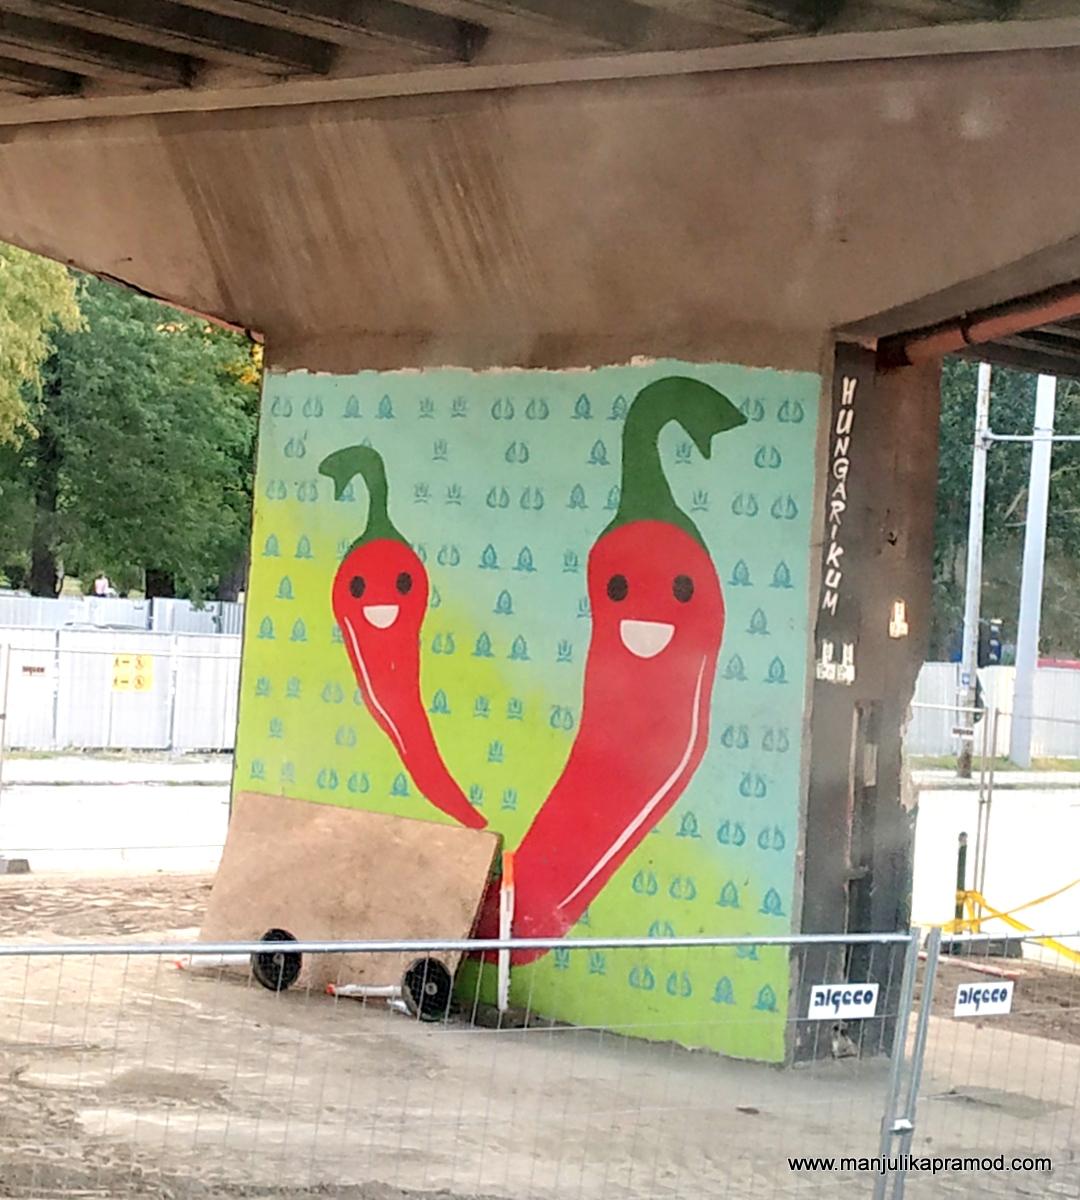 Chiili peppers on walls